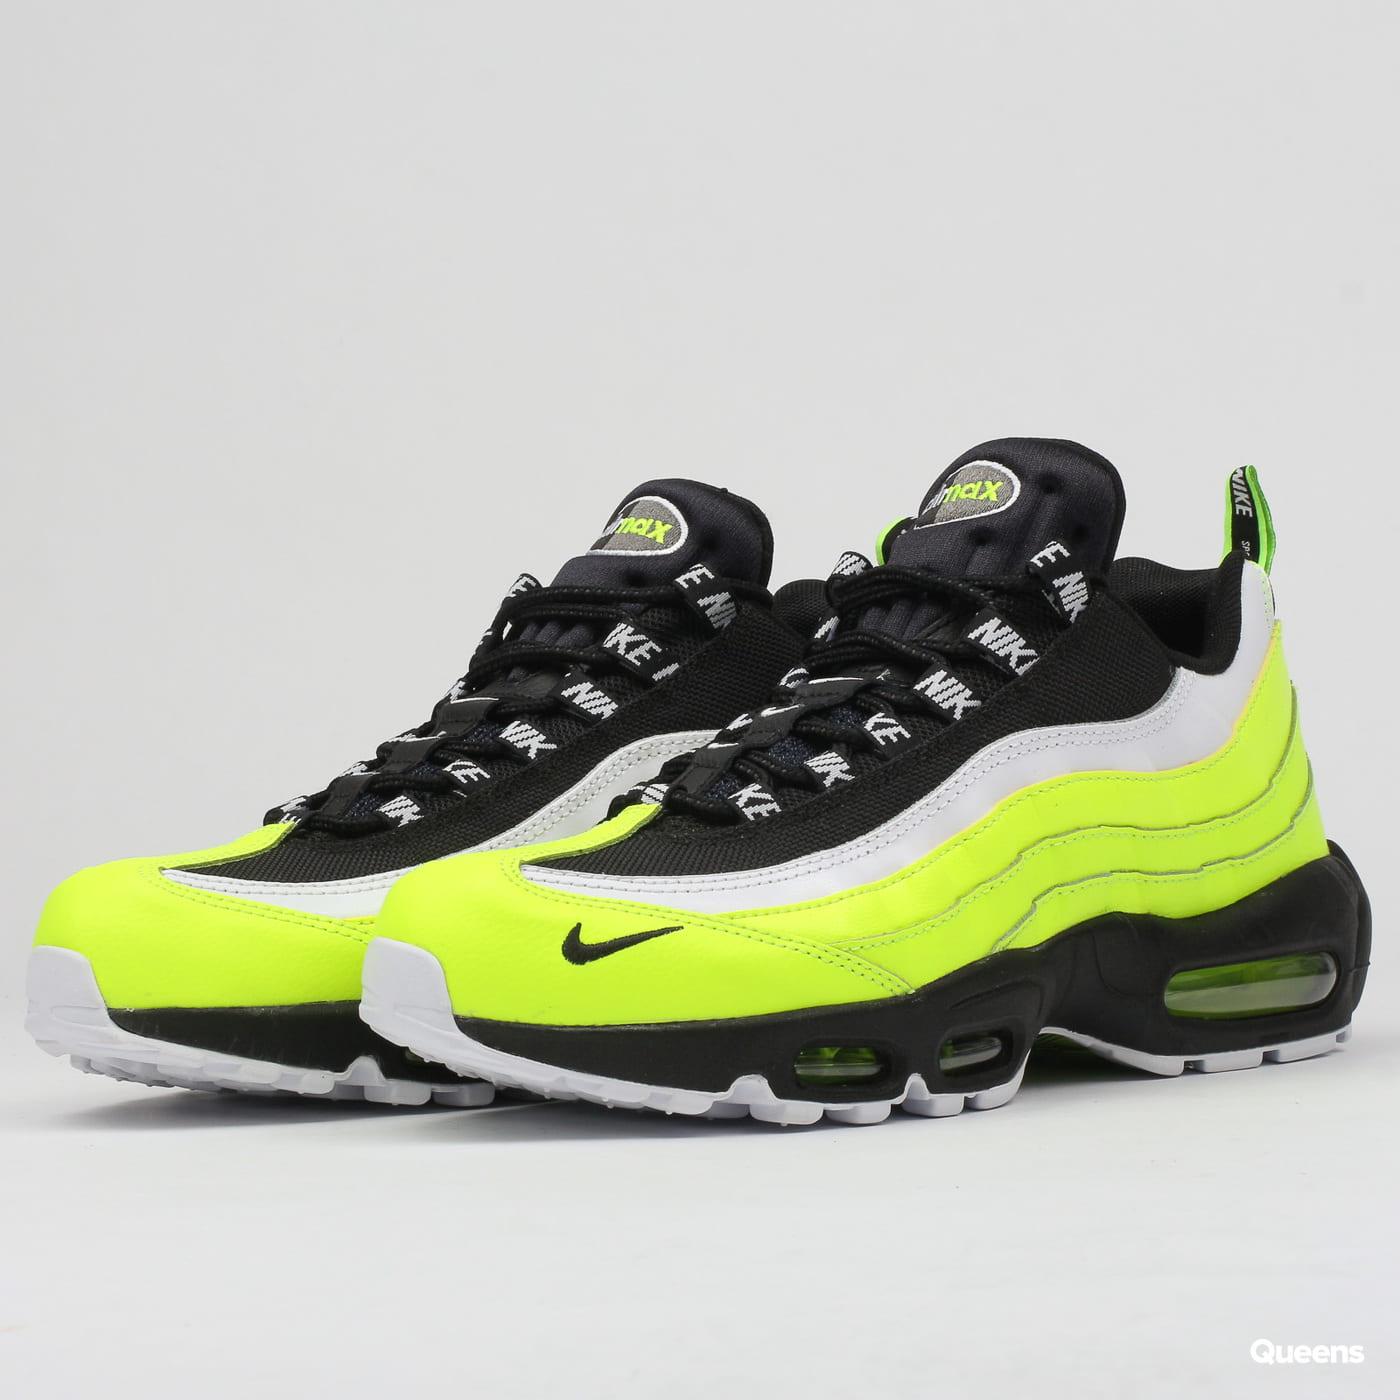 separation shoes 10db5 d6200 Sneakers Nike Air Max 95 Premium (538416-701)– Queens 💚